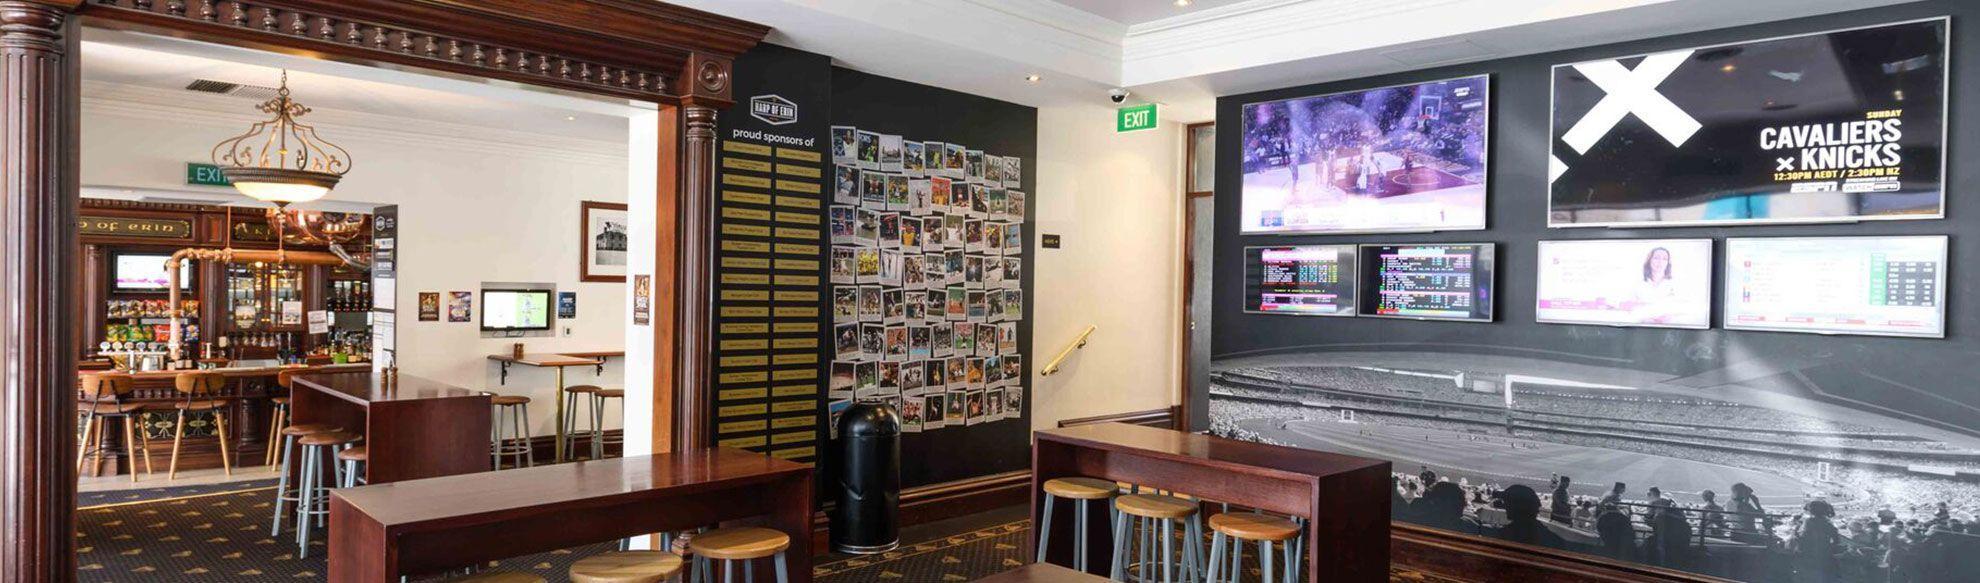 sports bar in Kew